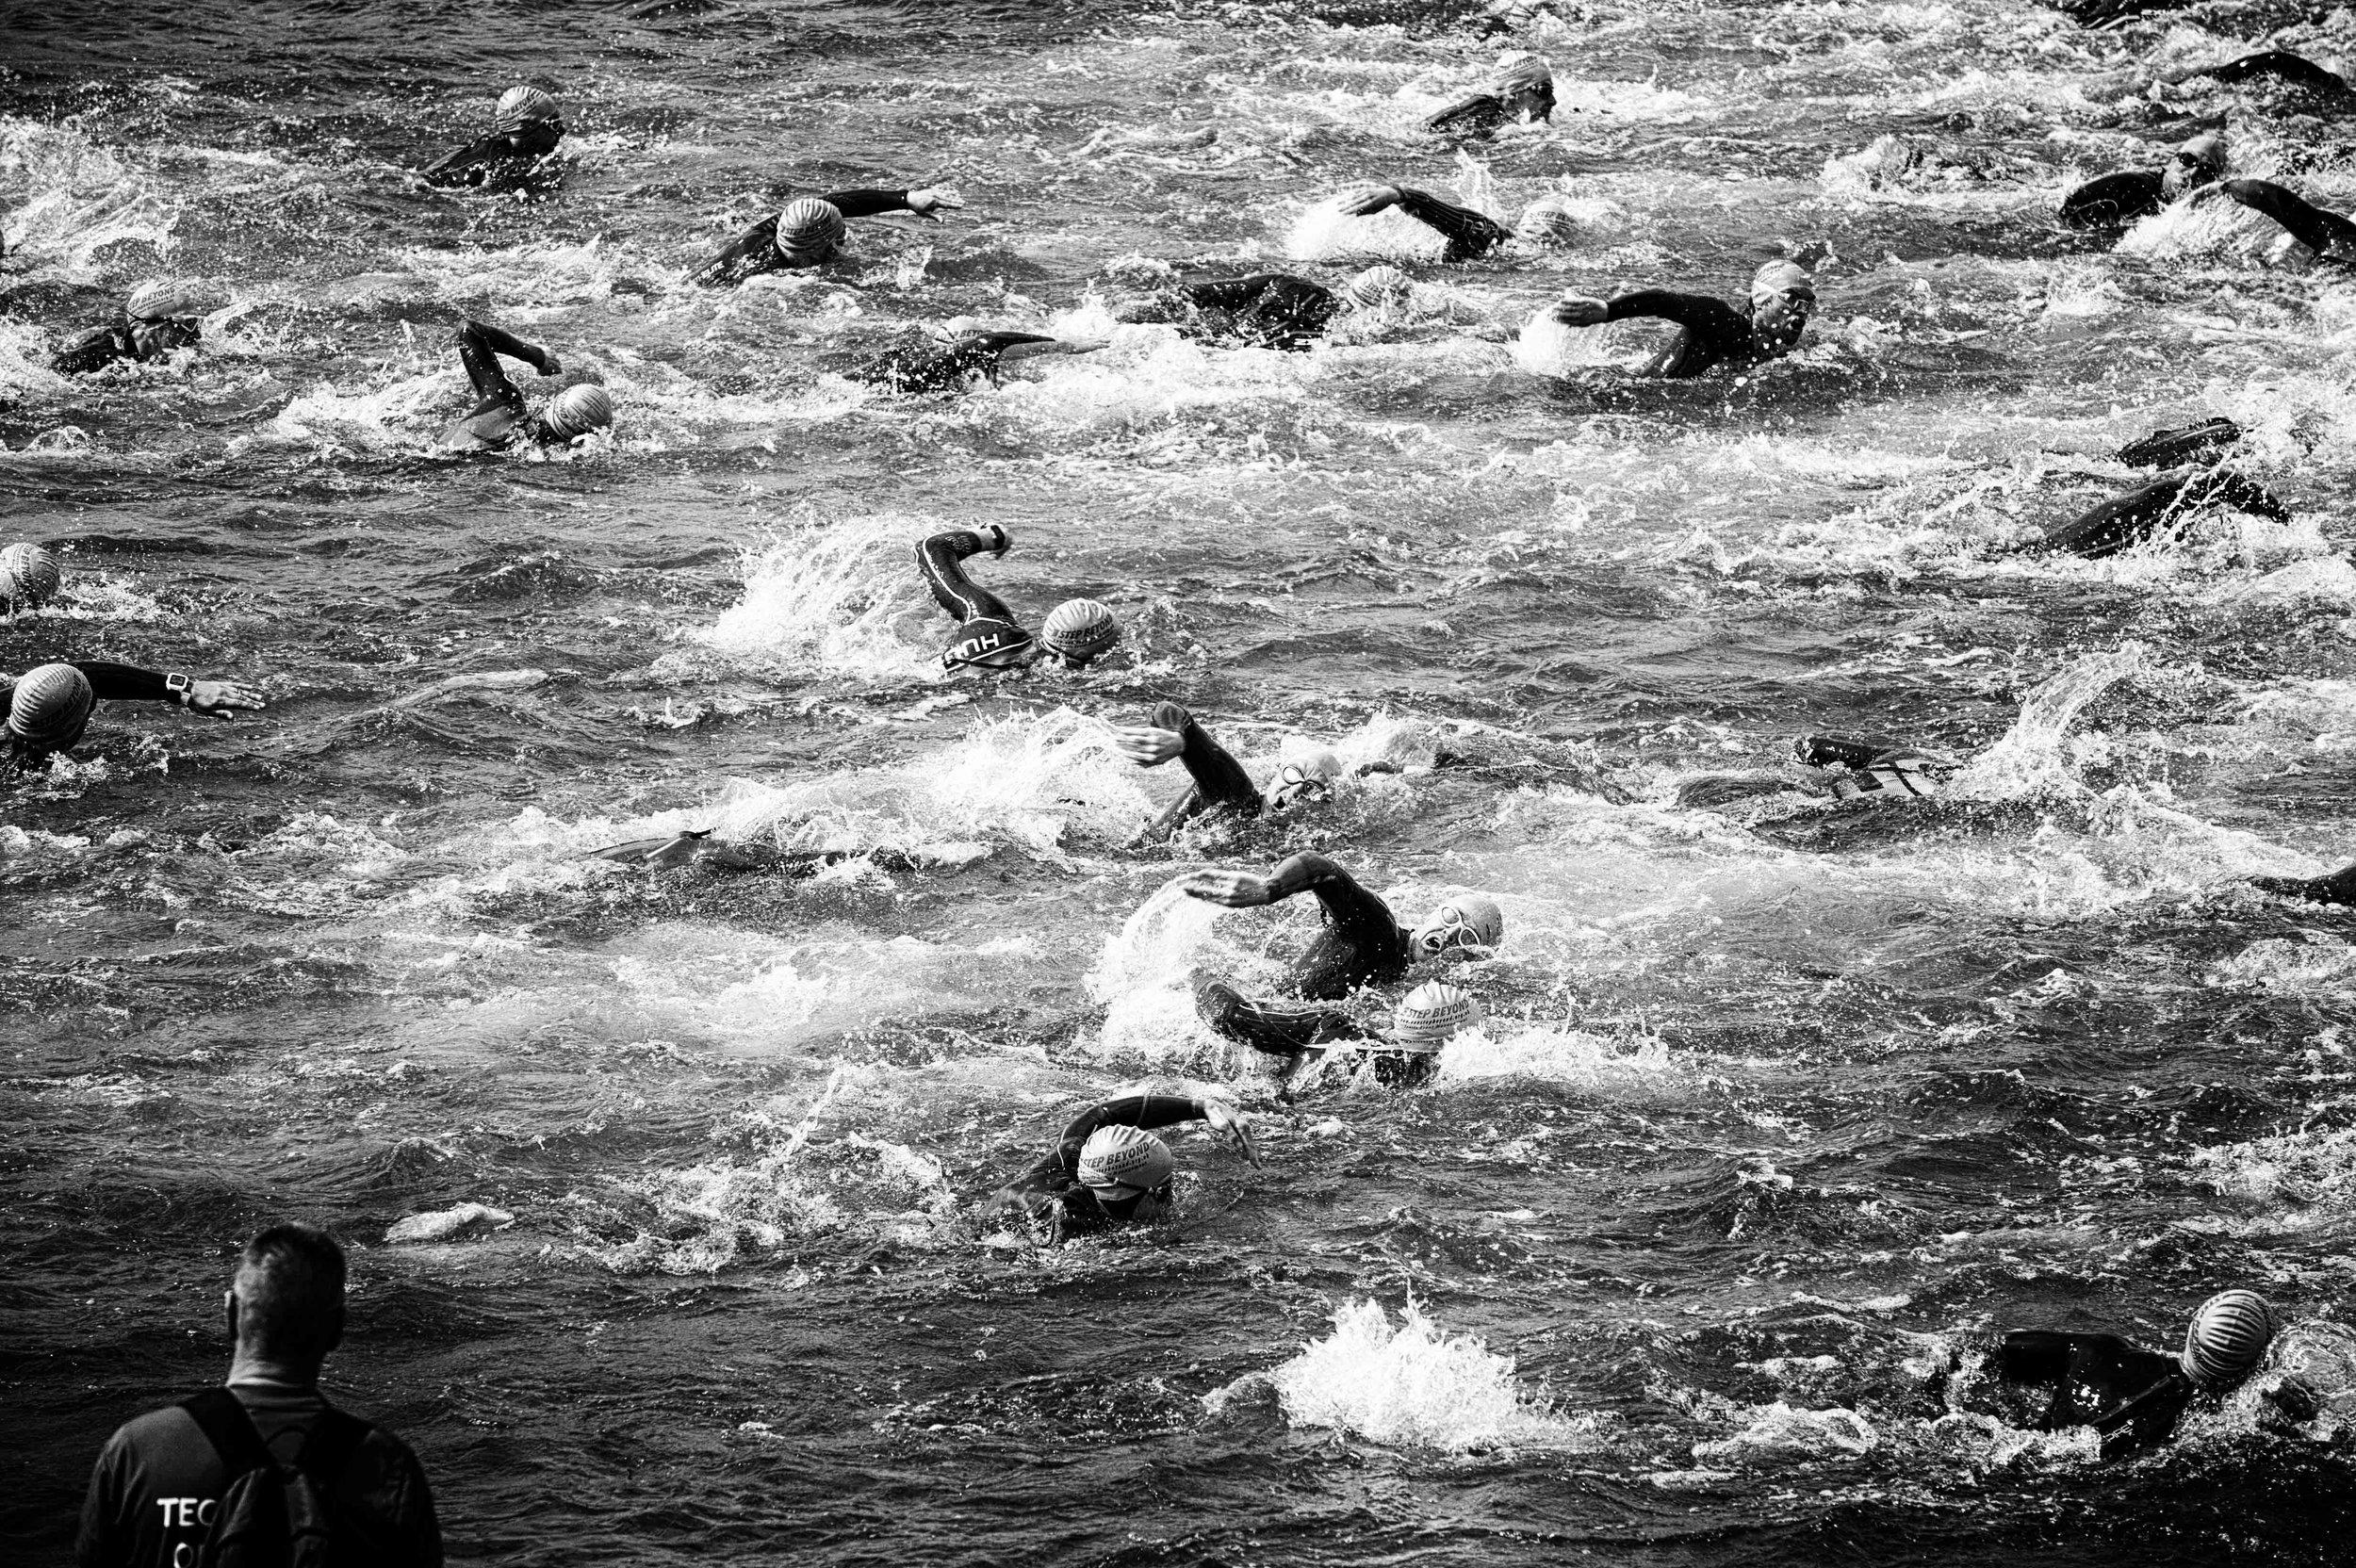 Cervelo Specialized Triathlon Nottingham The Tri Nerd 2016 Aniko Towers Photo-1.jpg